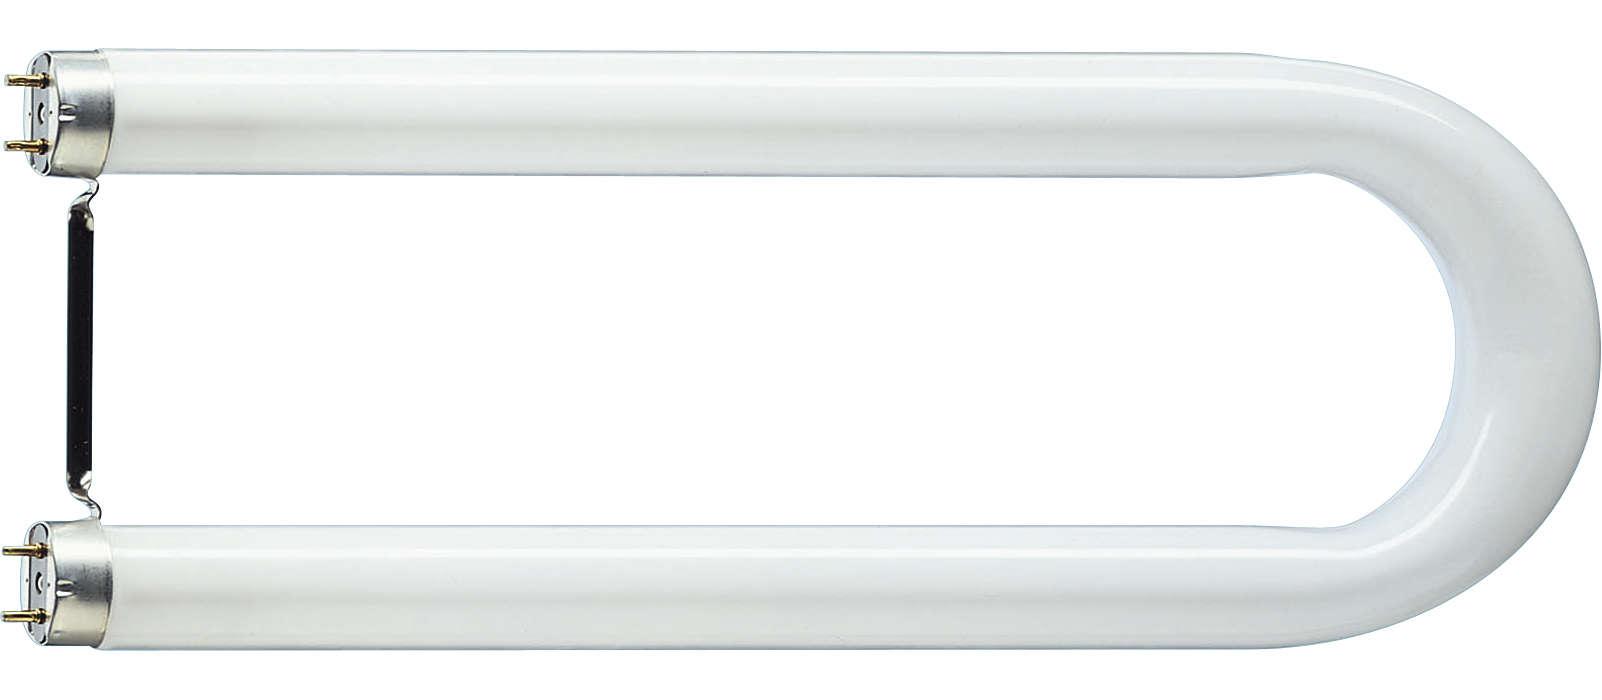 U-formet lysstofrør